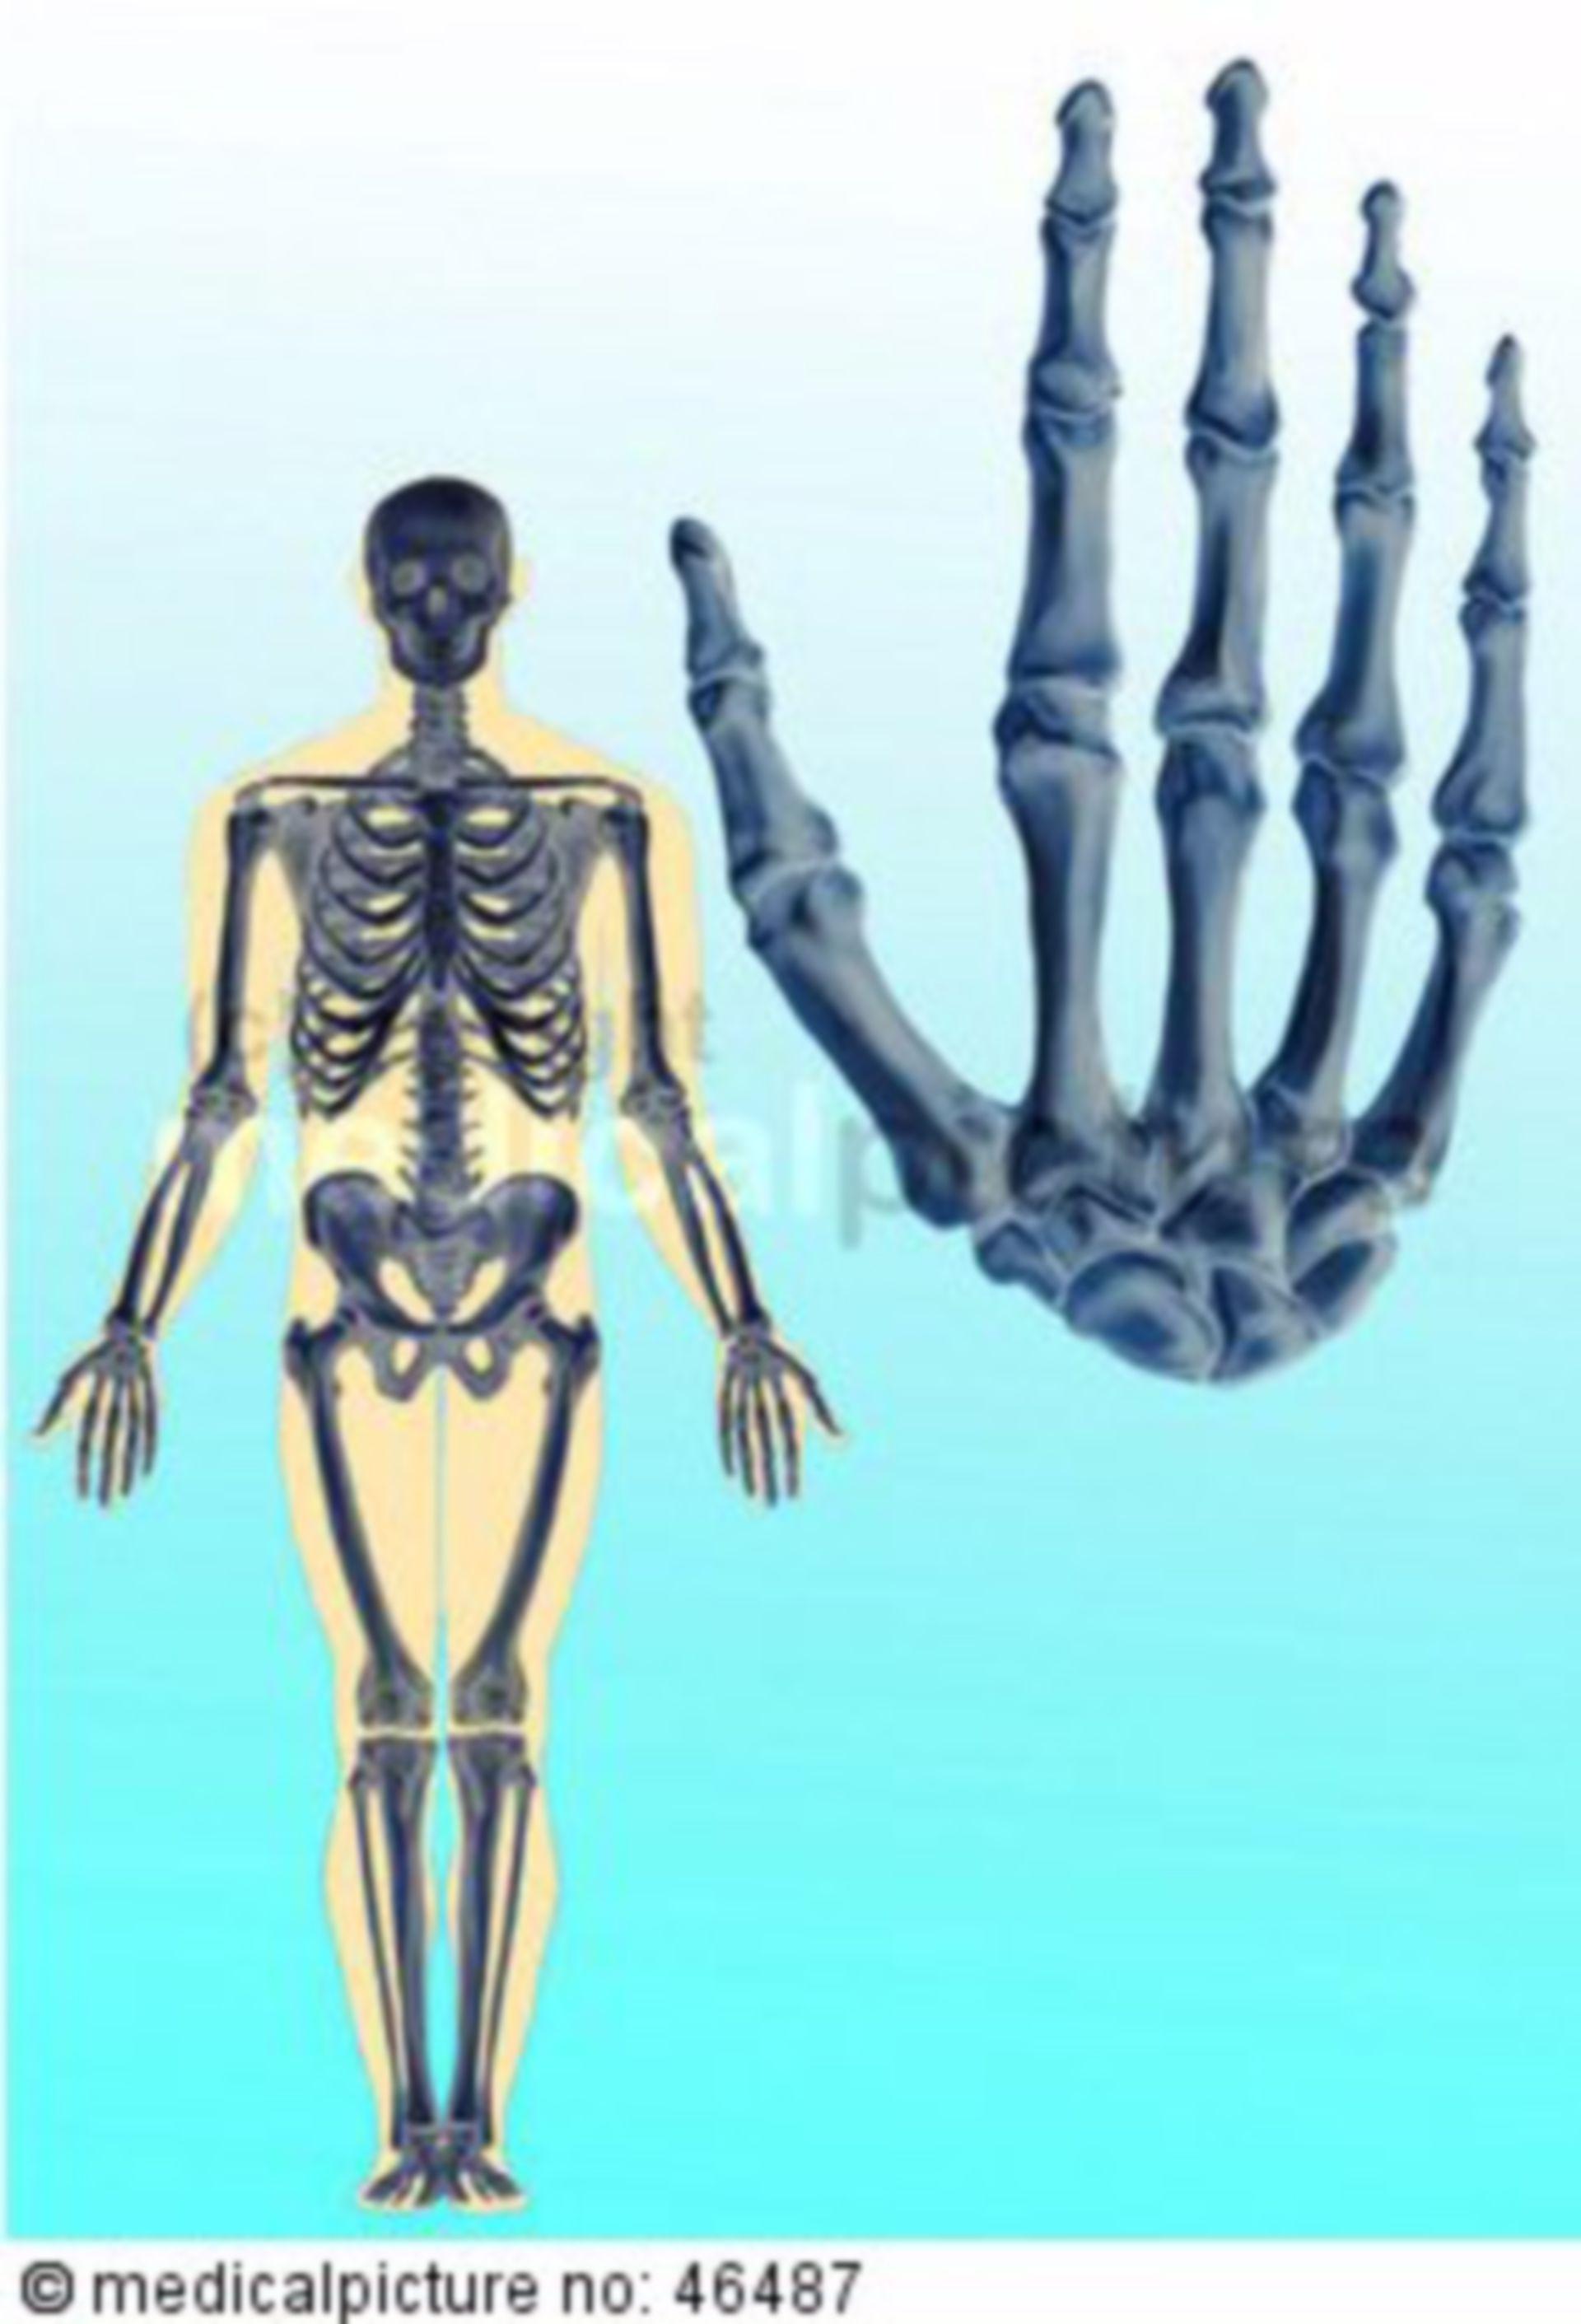 Human skeleton and hand bones